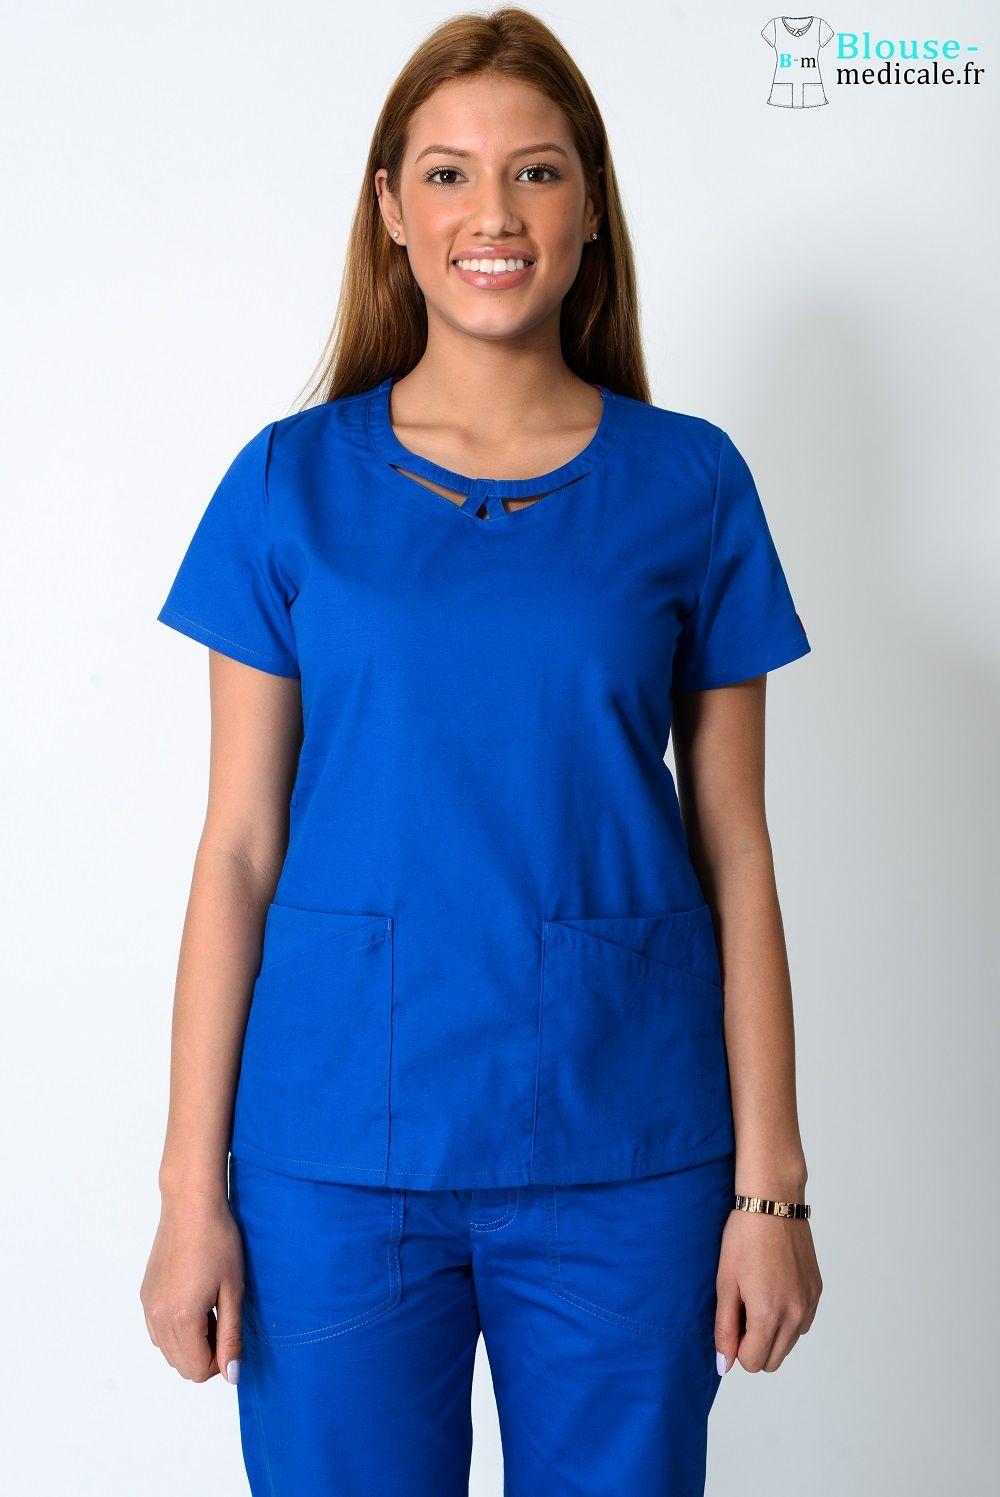 blouse medicale dickies femme 85810 bleu royal